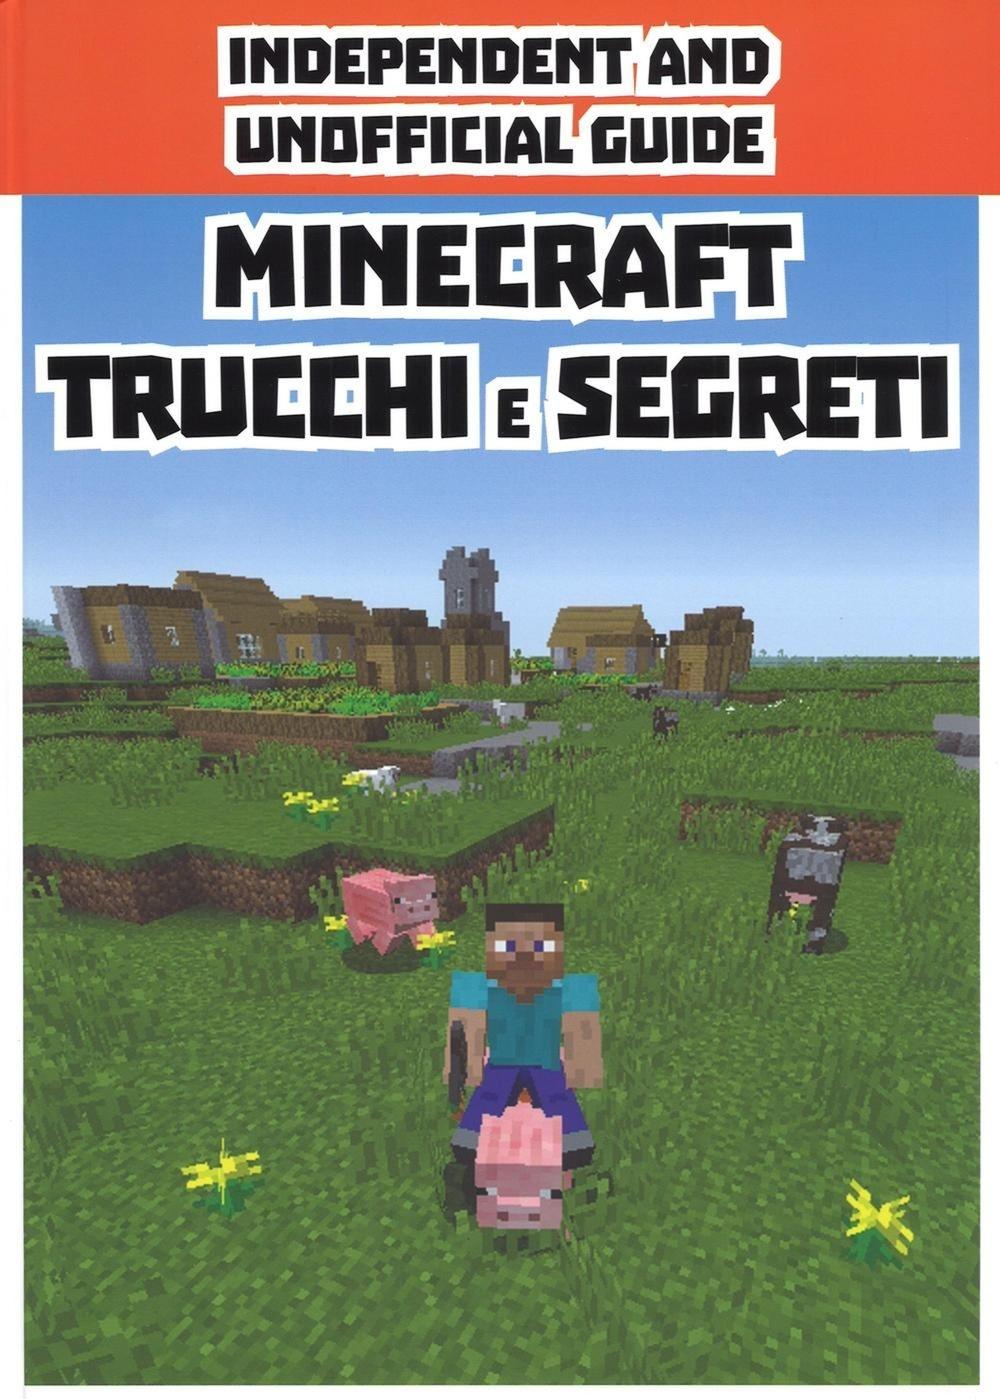 Minecraft trucchi e segreti. Indipendent and unofficial guide